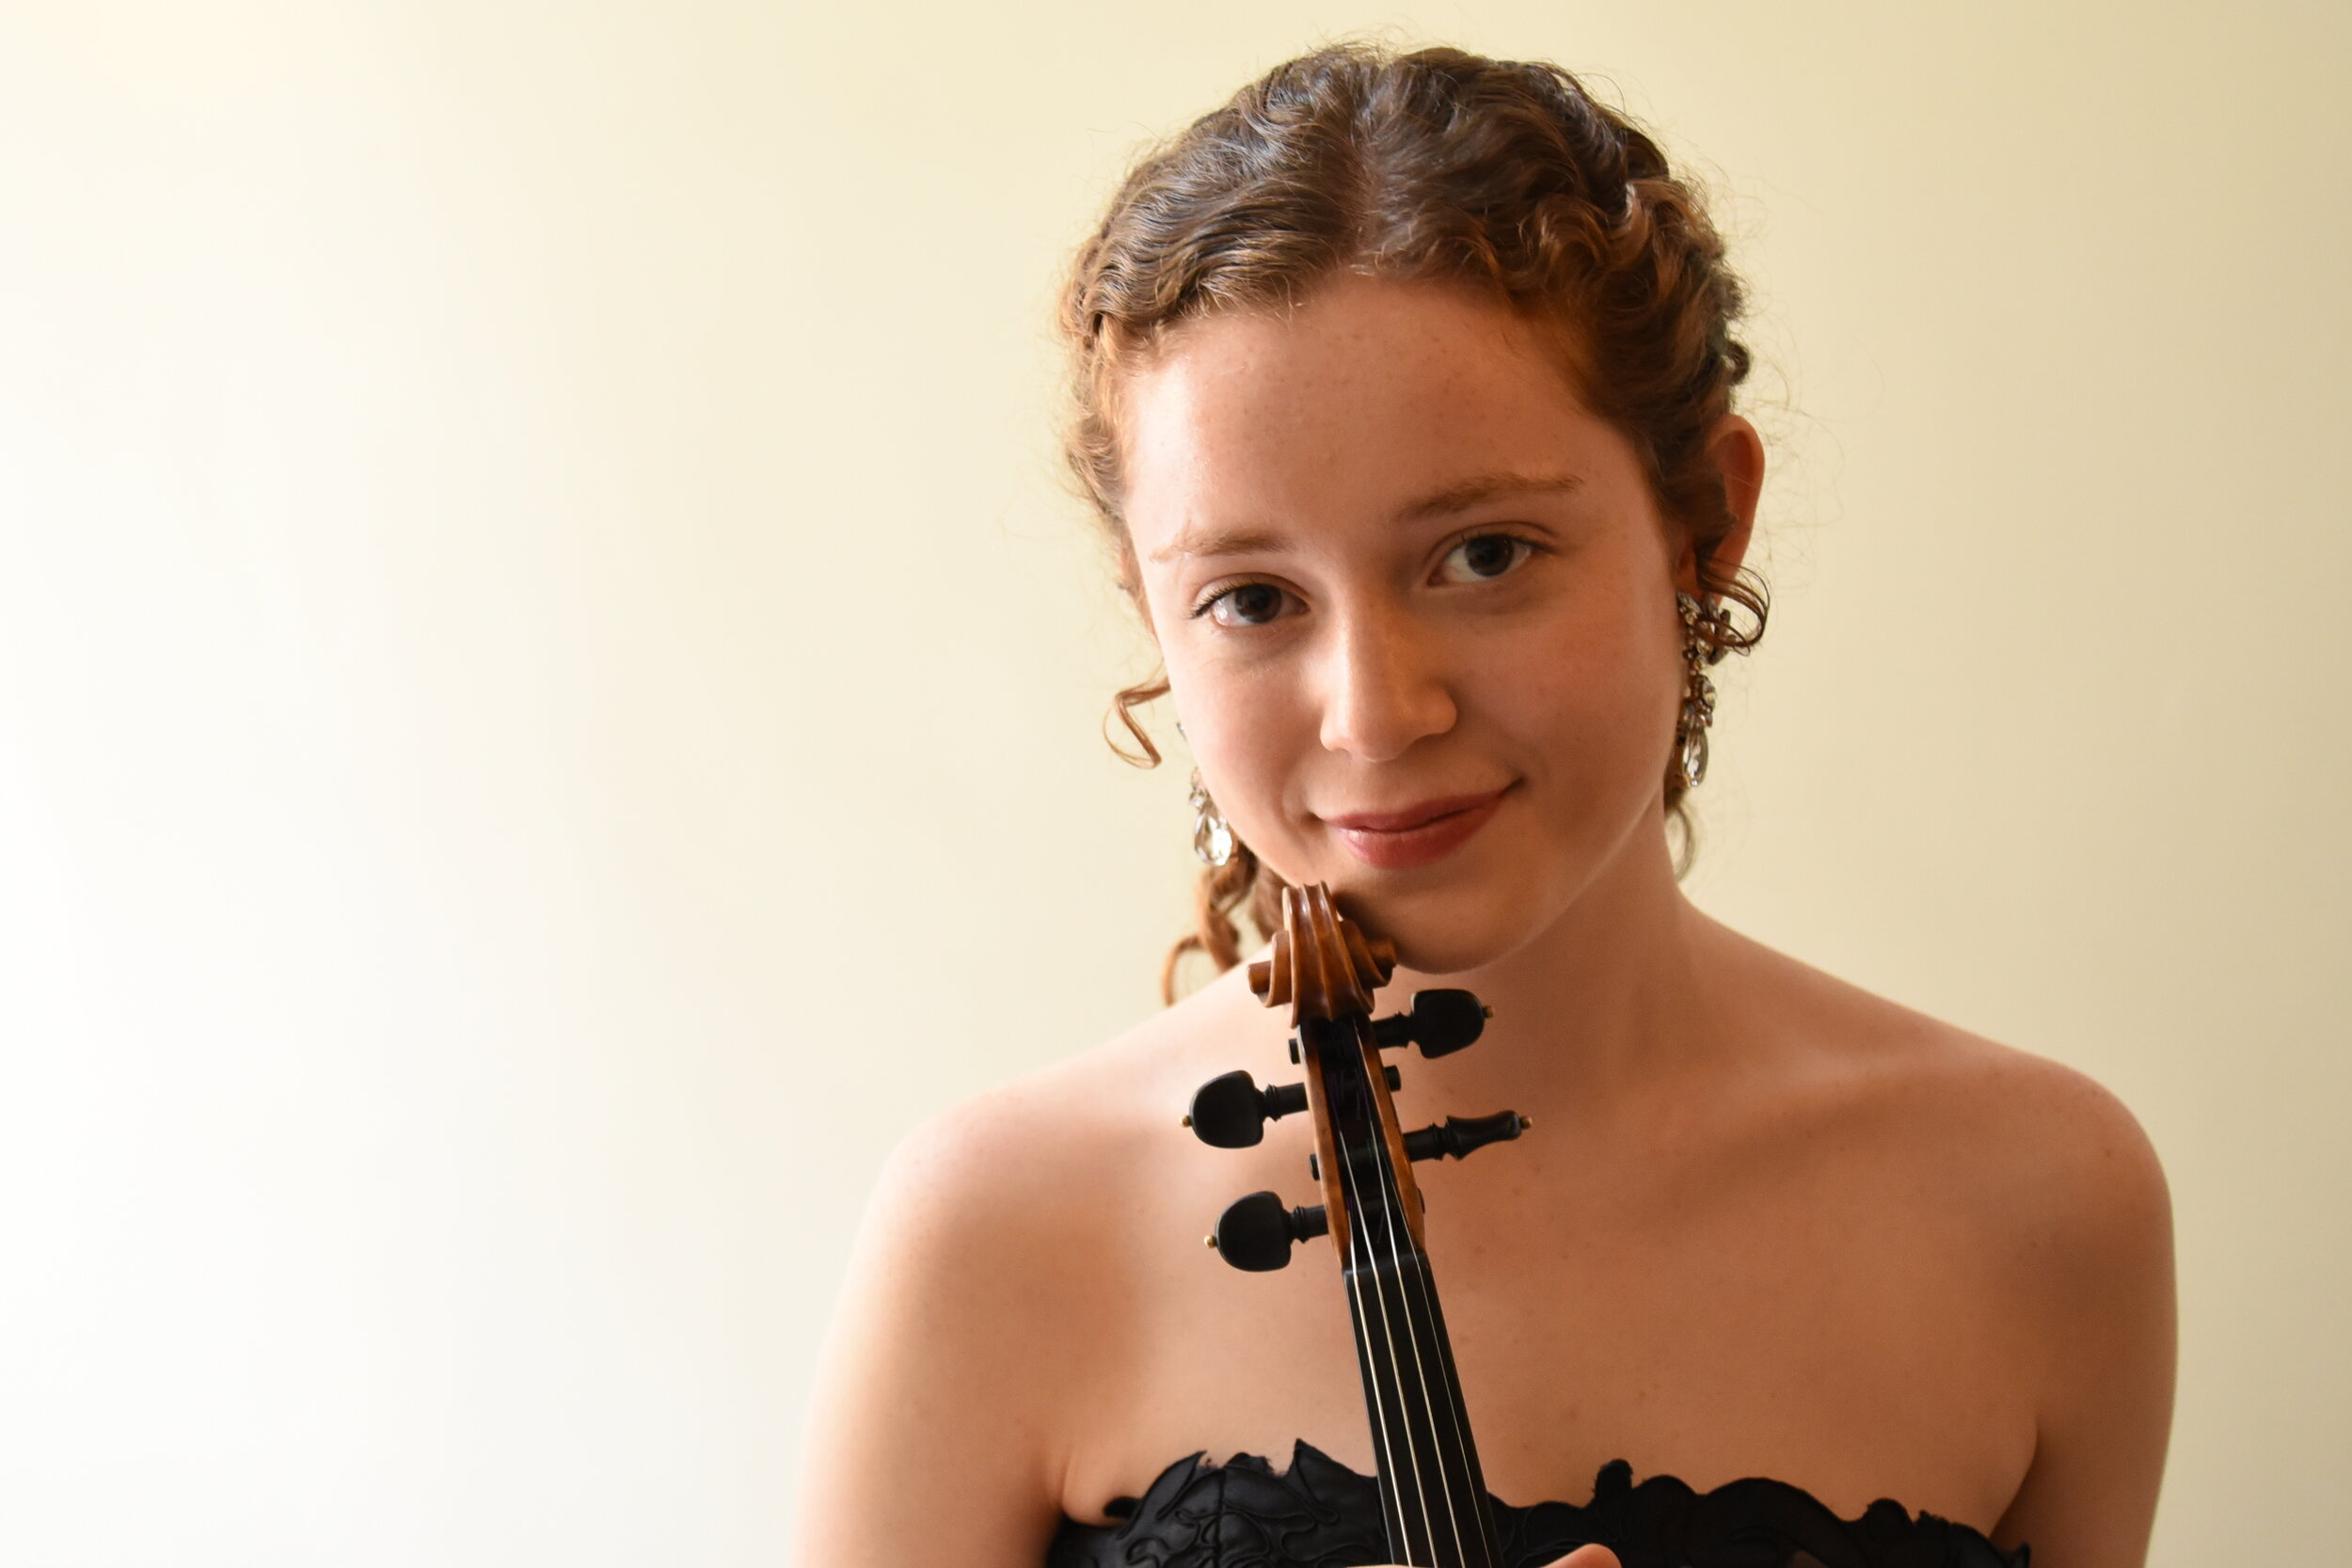 Maïthéna Girault, violin